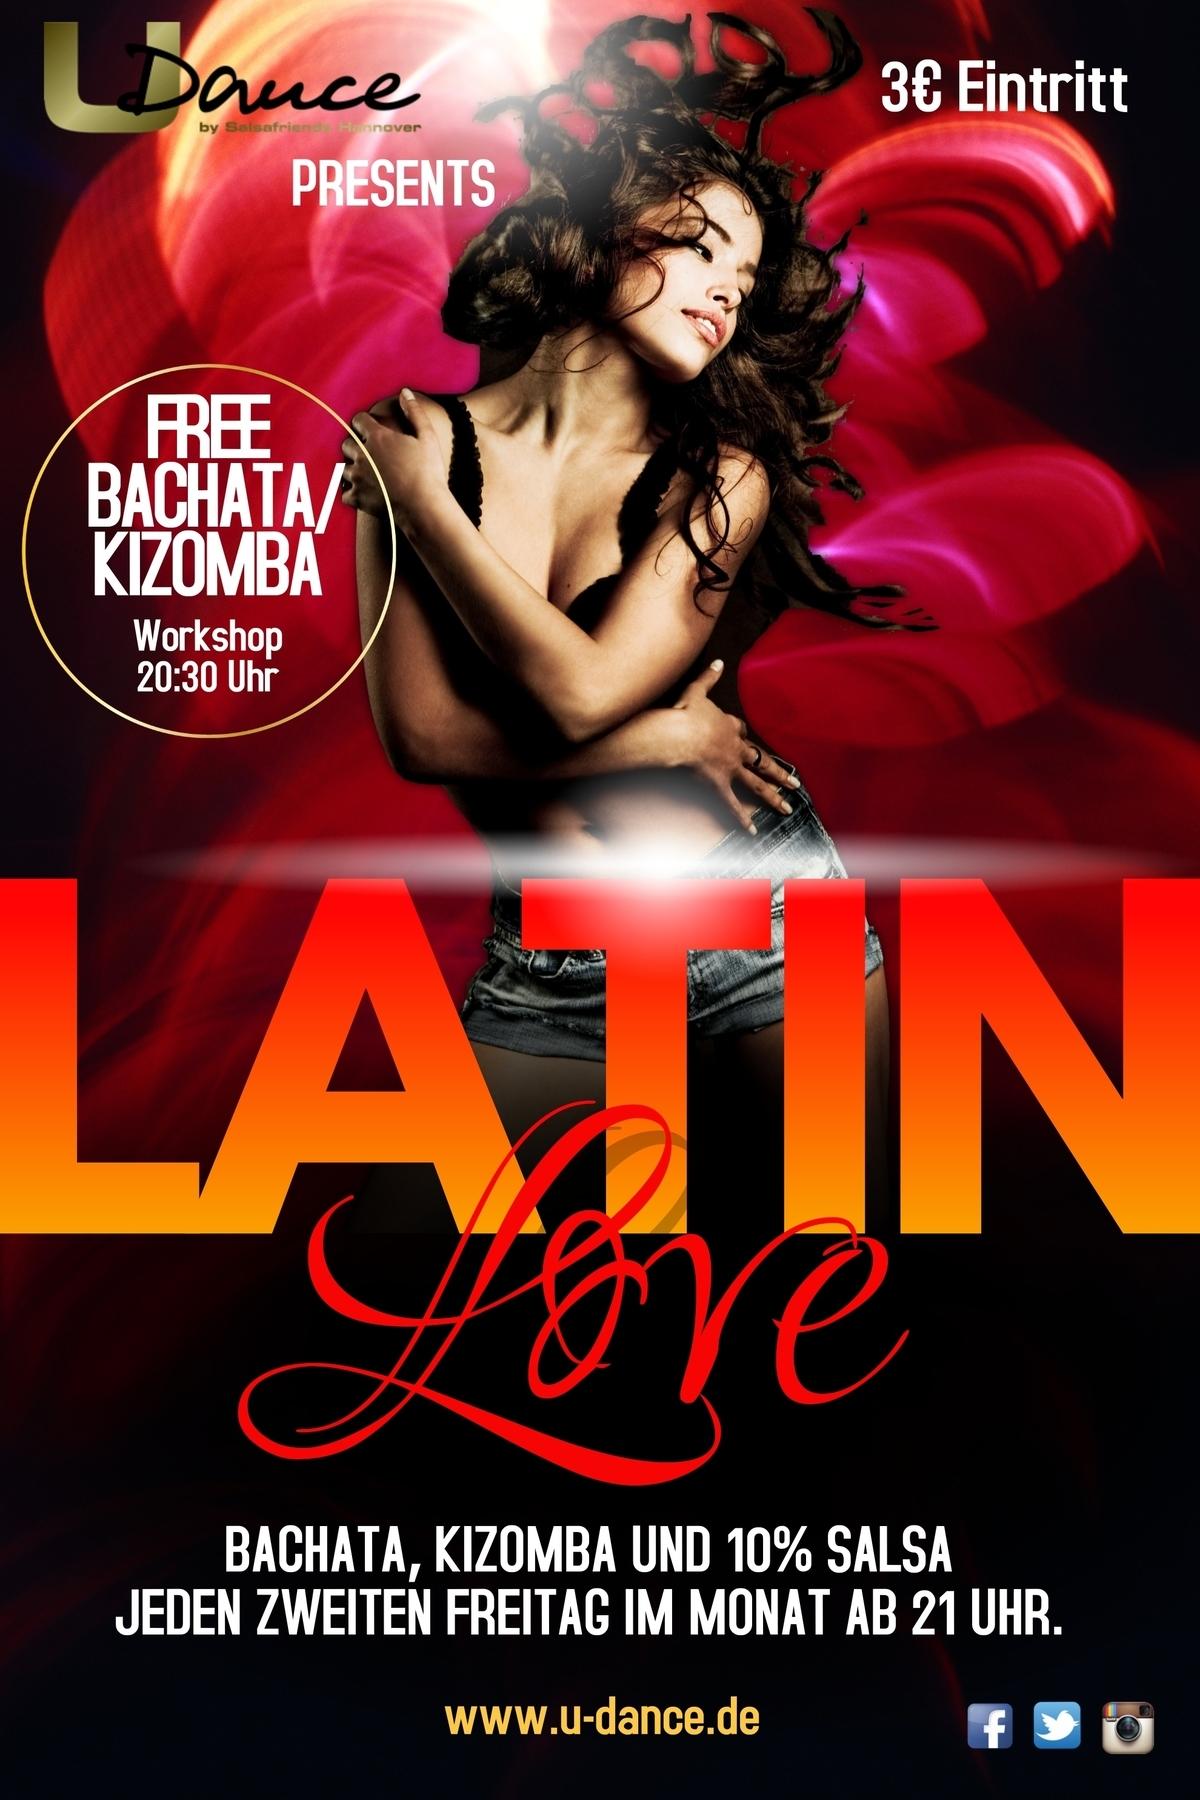 LATIN LOVE PARTY MIT KIZOMBA BACHATA SALSA in Hannover